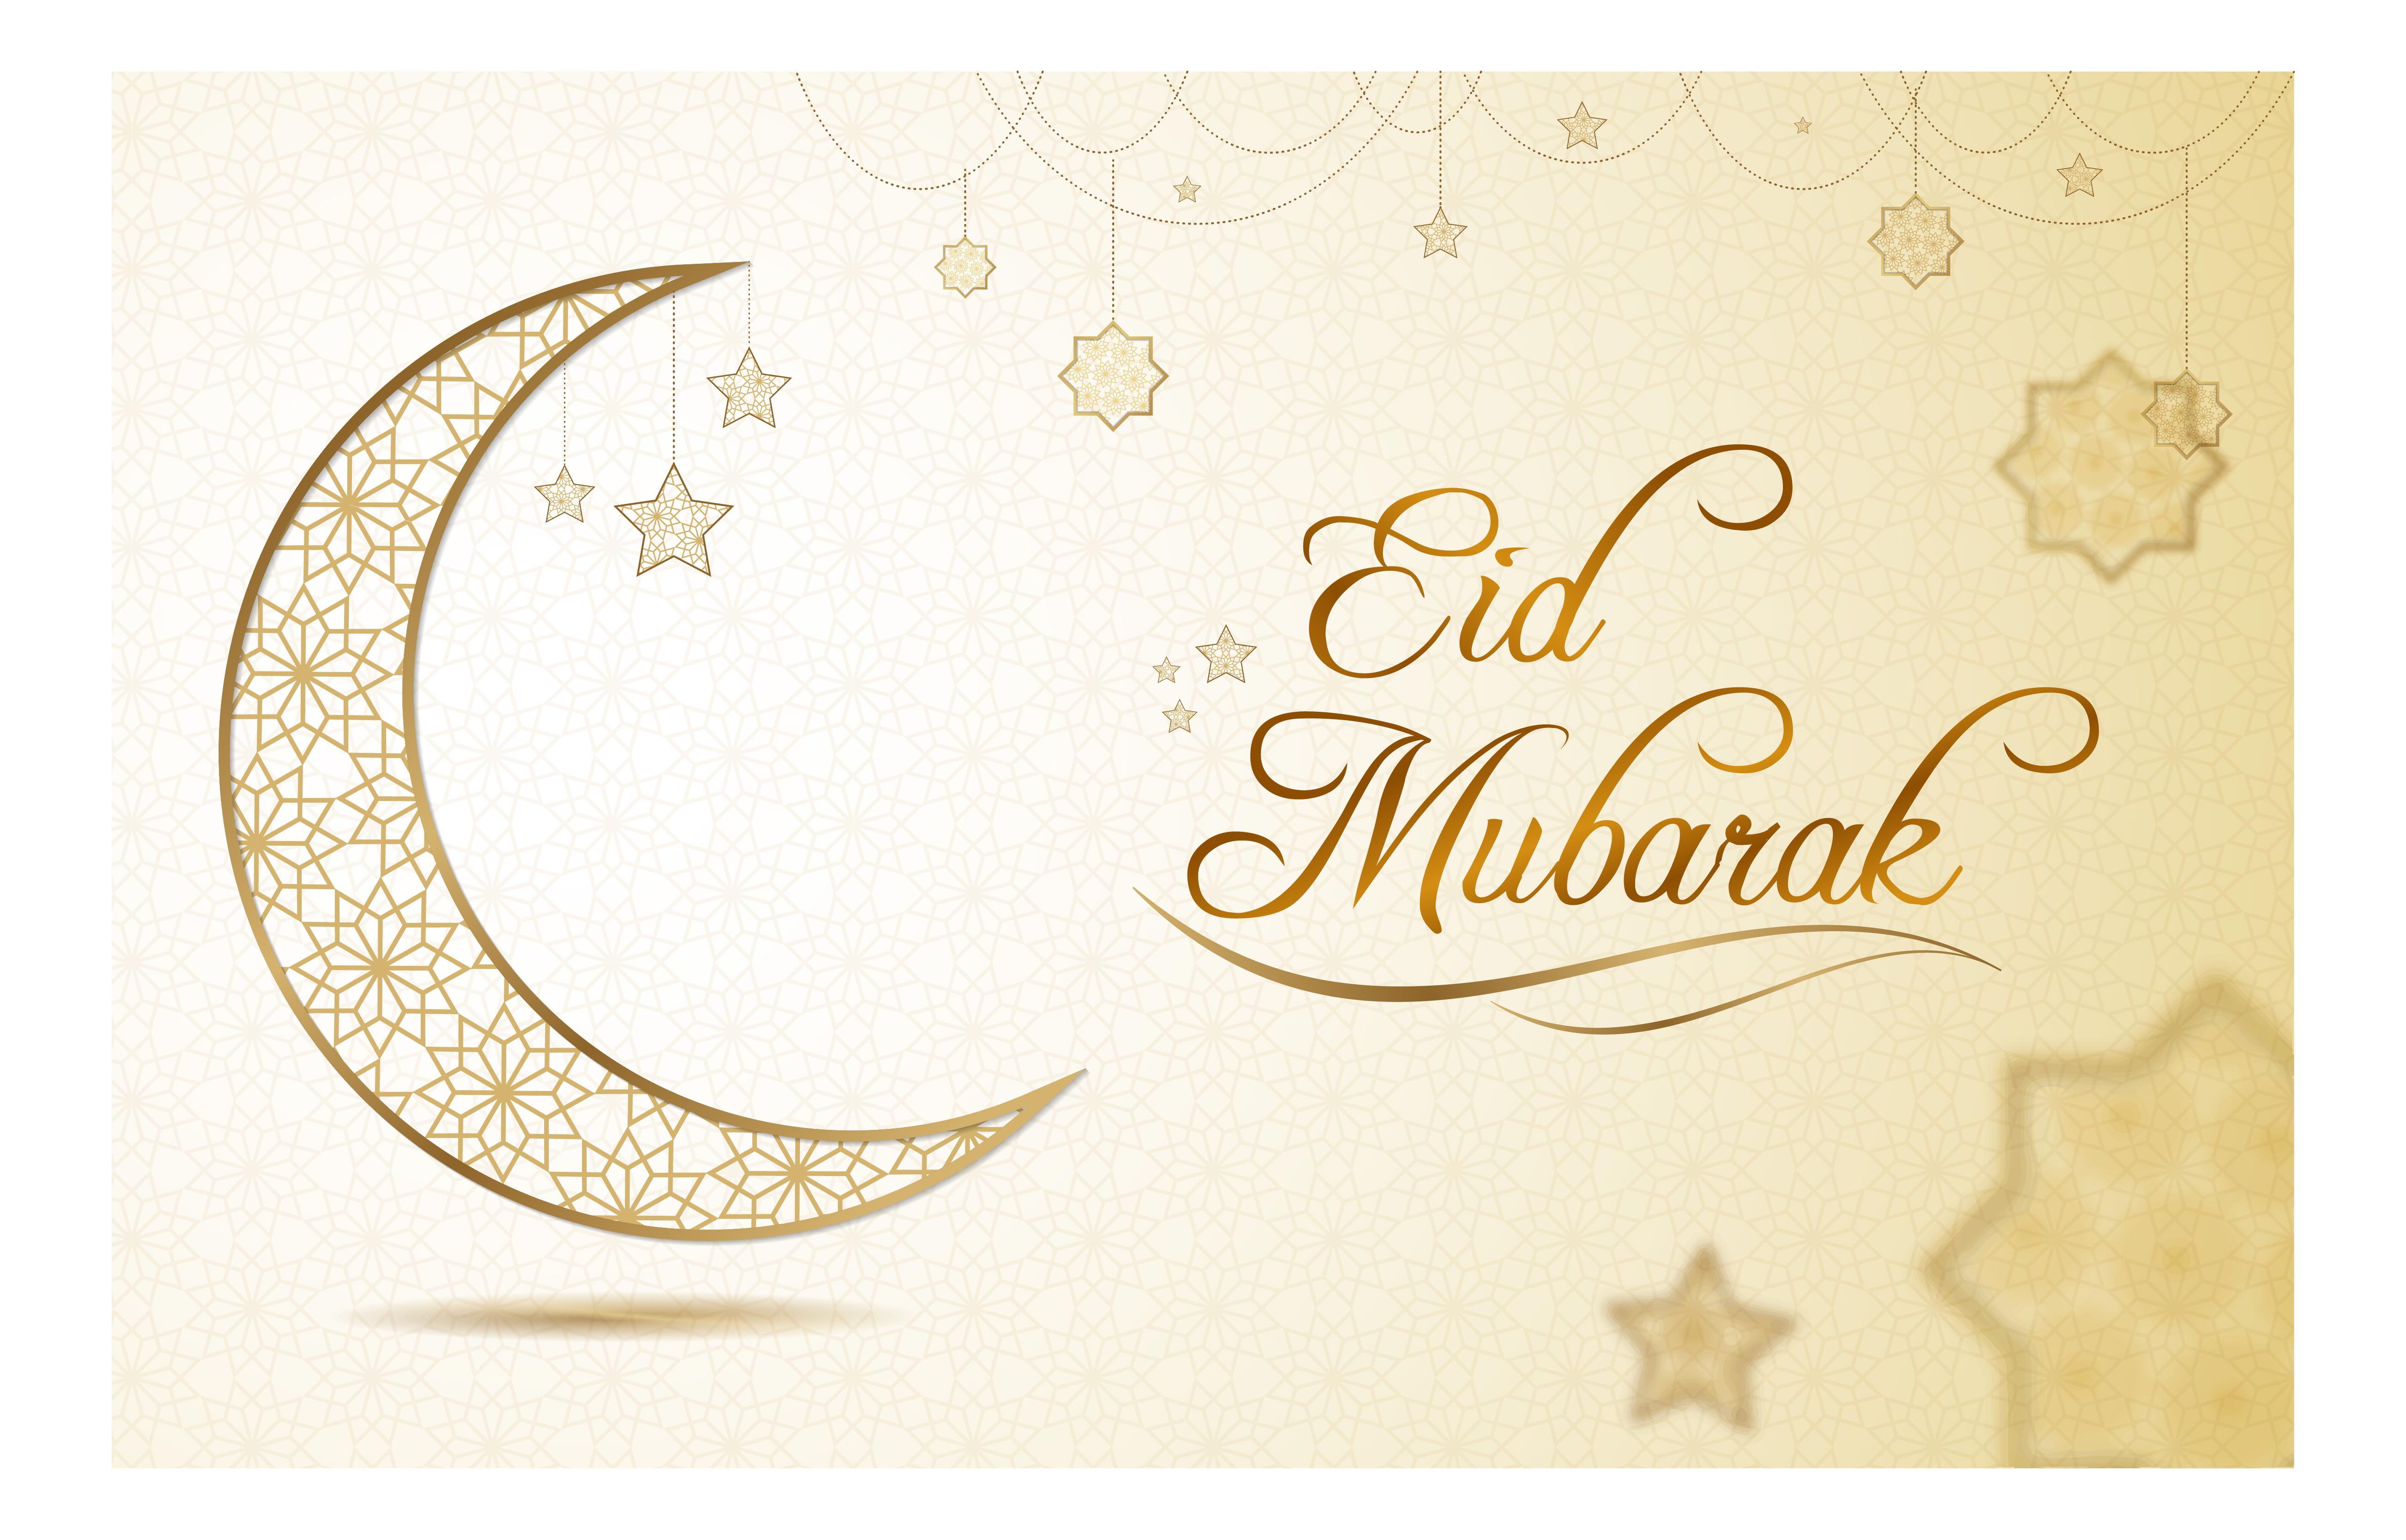 Eid Mubarak Greeting With Gold Star Pattern 1057422 Vector Art At Vecteezy